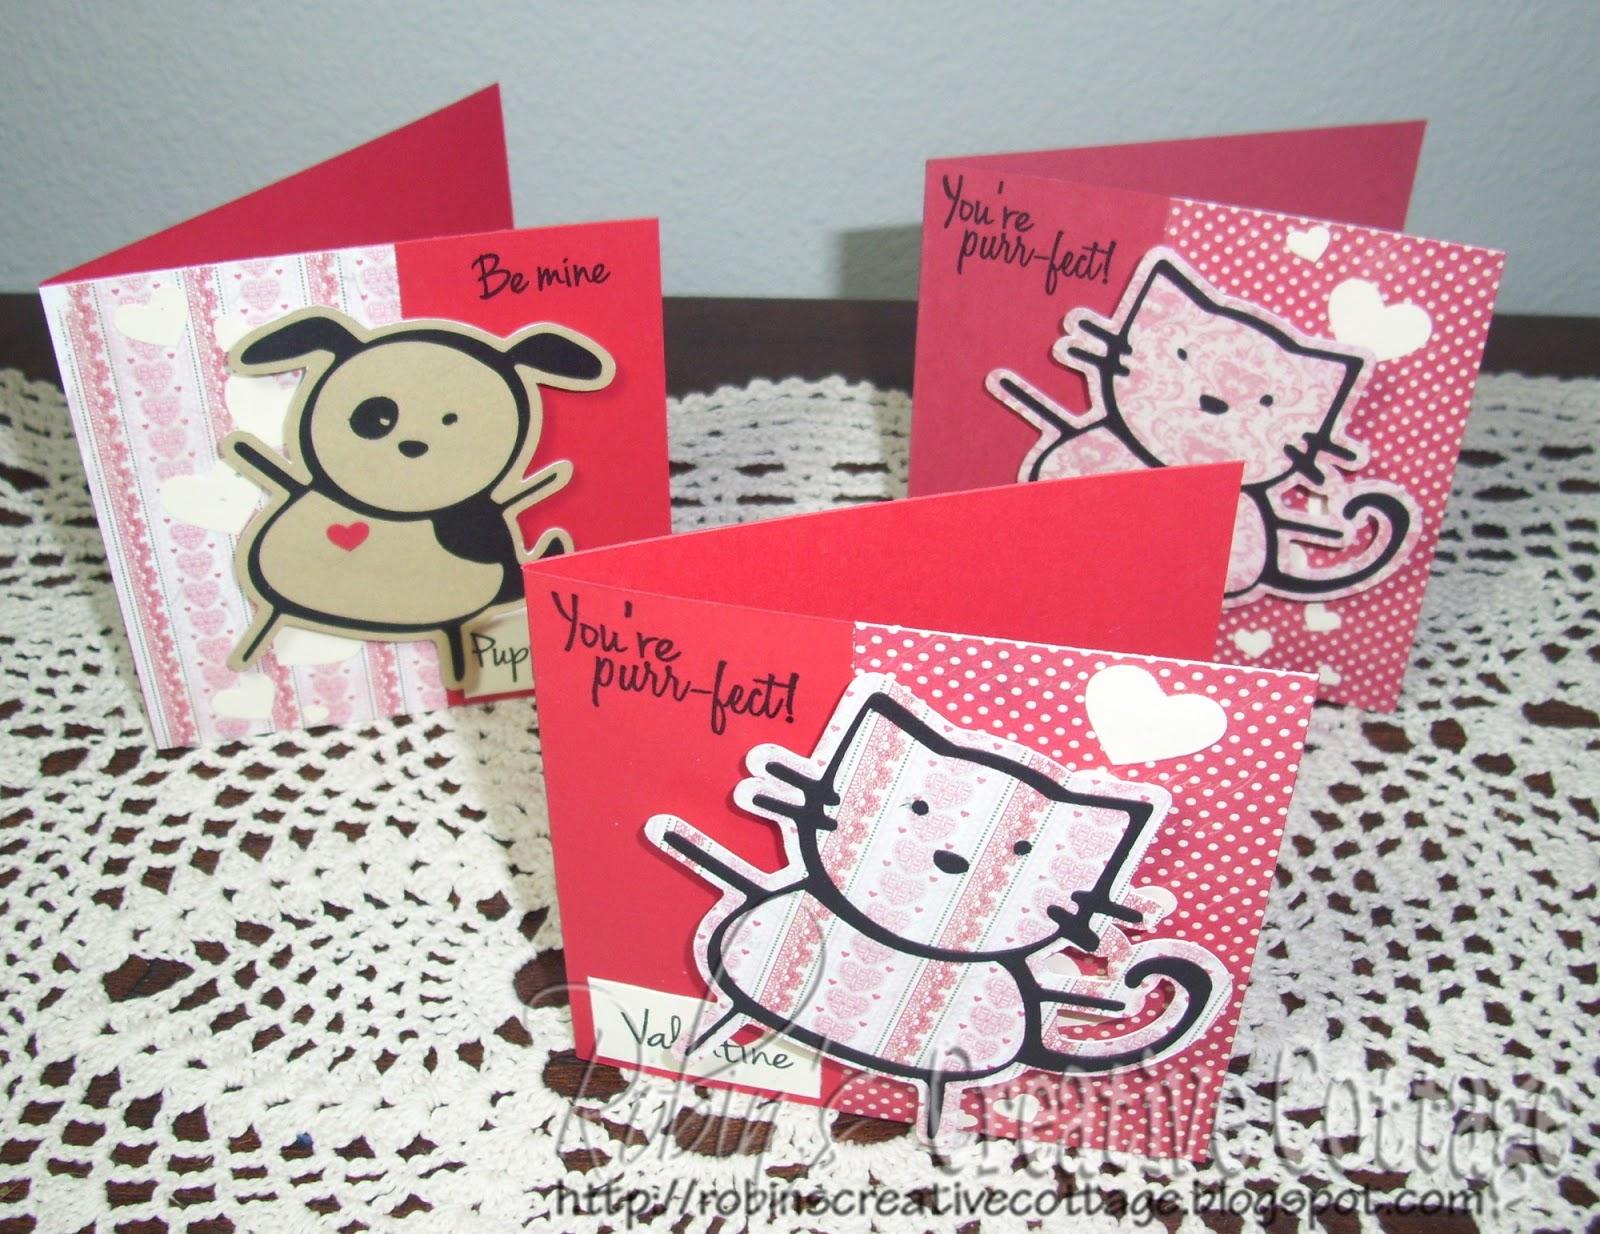 Robins Creative Cottage February 2013 – Cricut Valentines Cards